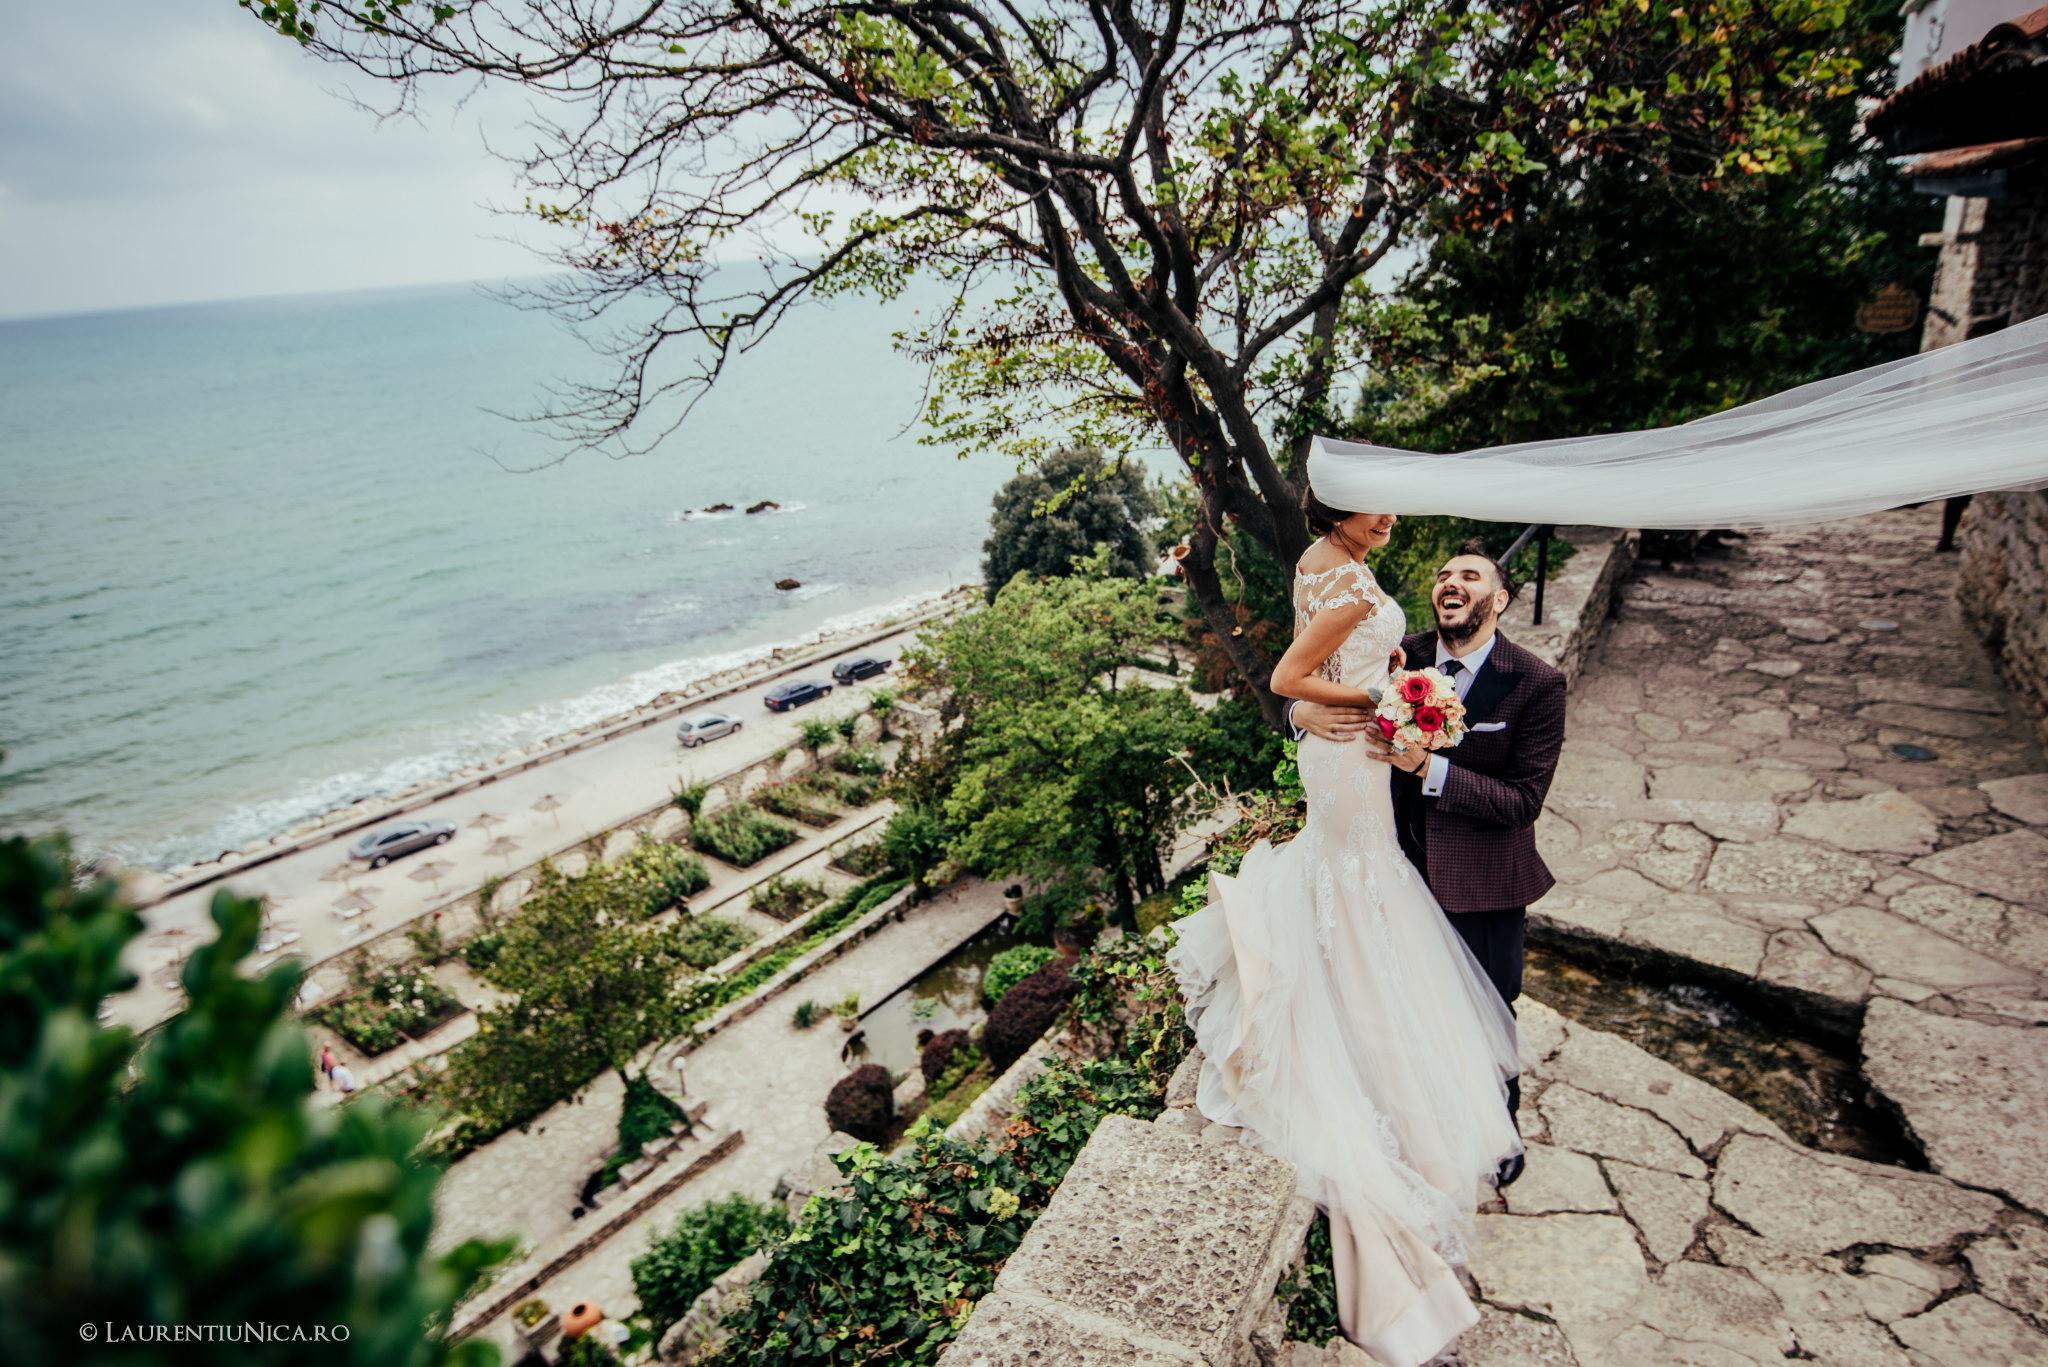 andreea si alin fotografii after wedding balchik bulgaria21 - Andreea & Alin | Fotografii After Wedding | Balchik Bulgaria